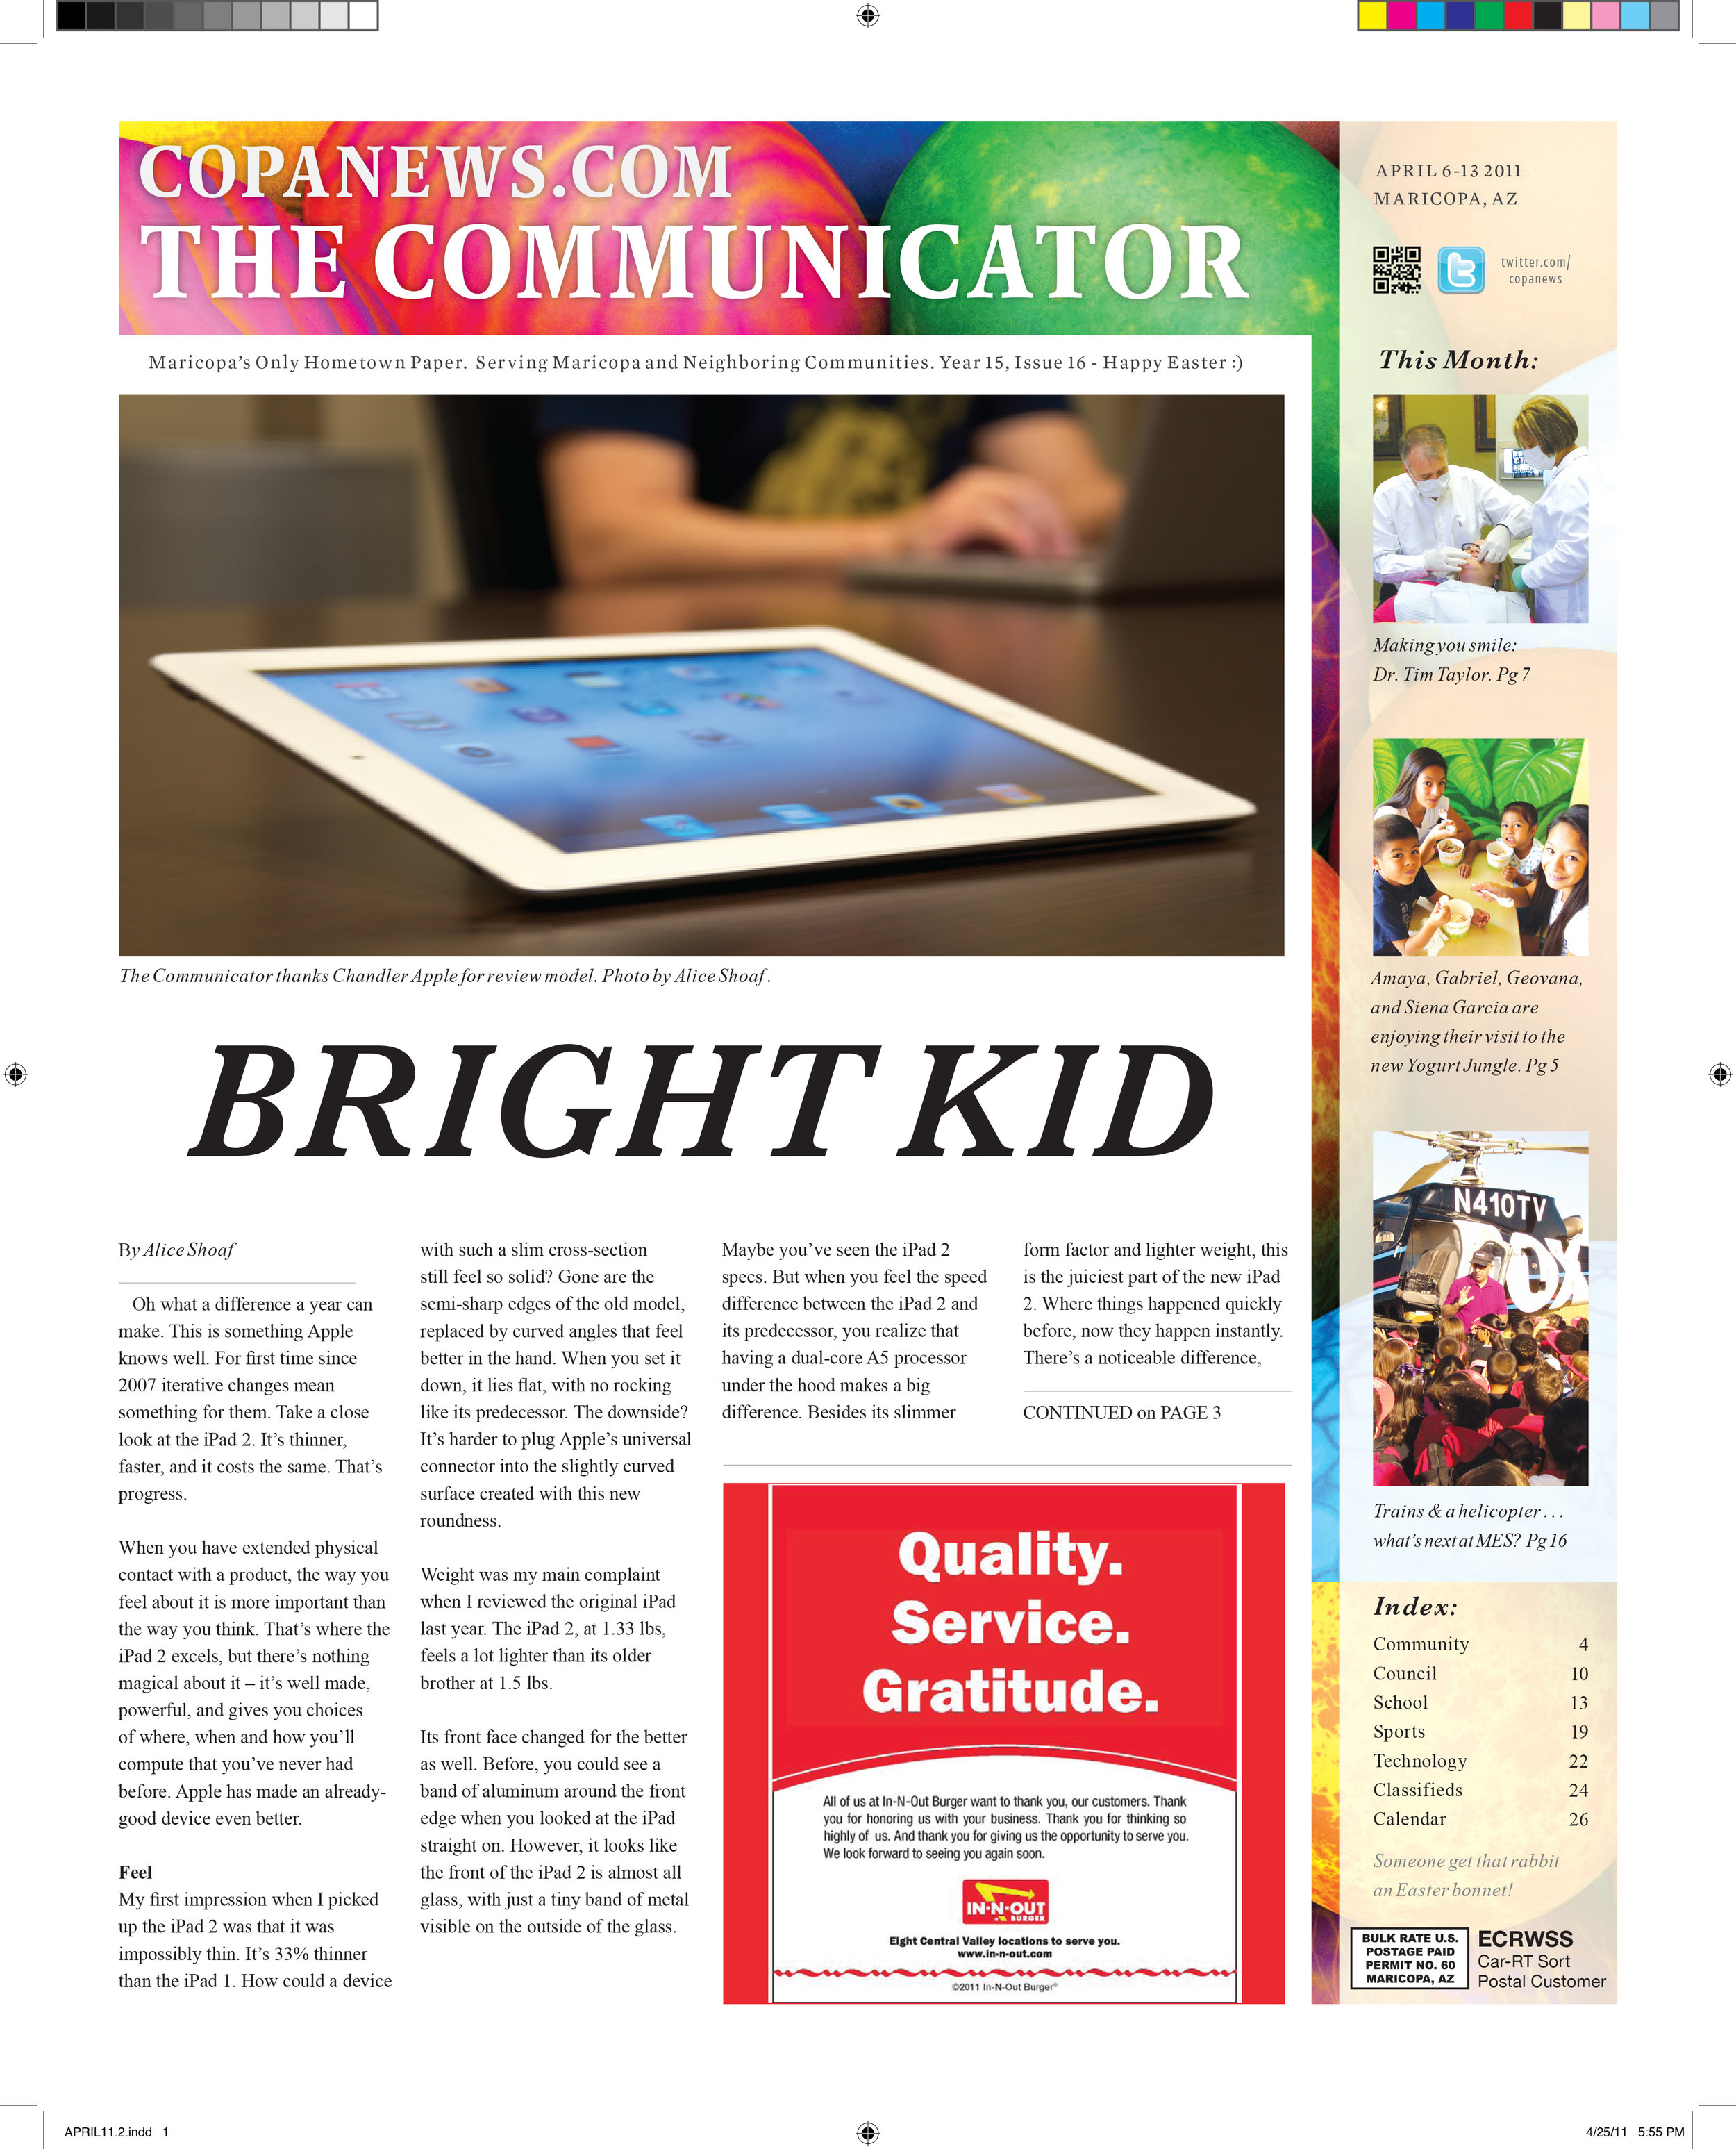 The Communicator_1.jpg